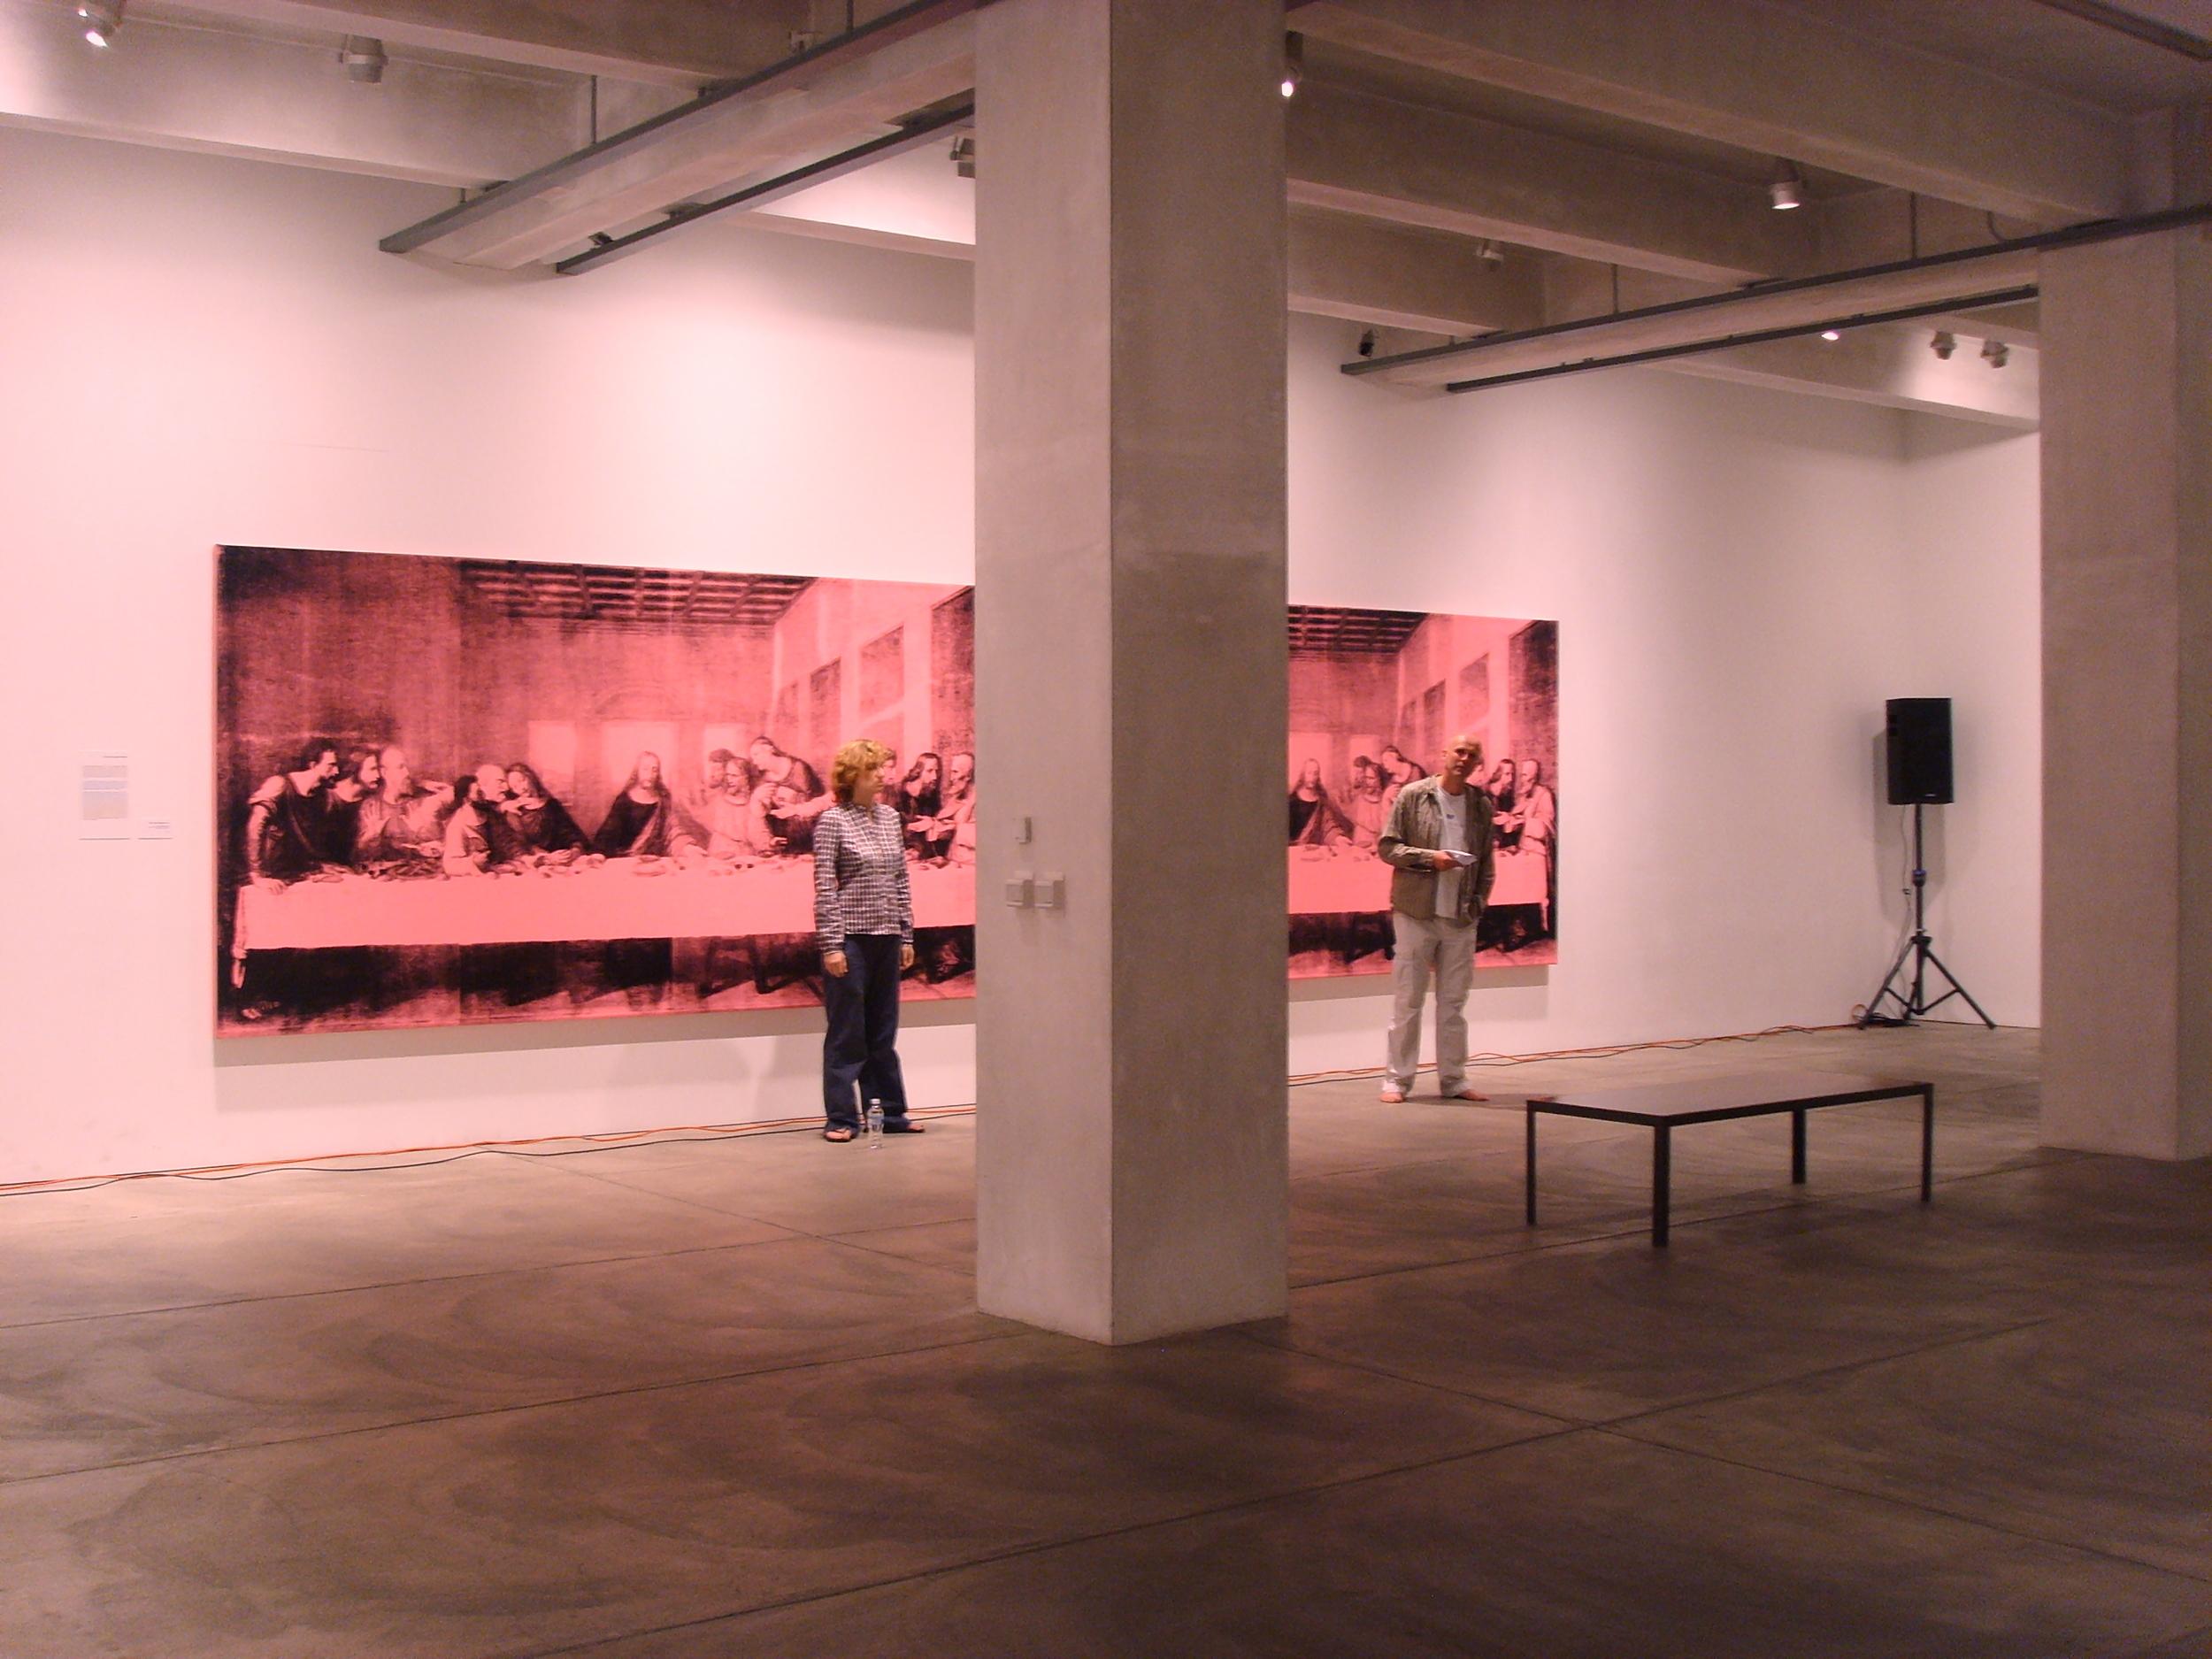 Tim-Crouch-England-Andy-Warhol-Museum-Pittsburgh-September-2008.jpg